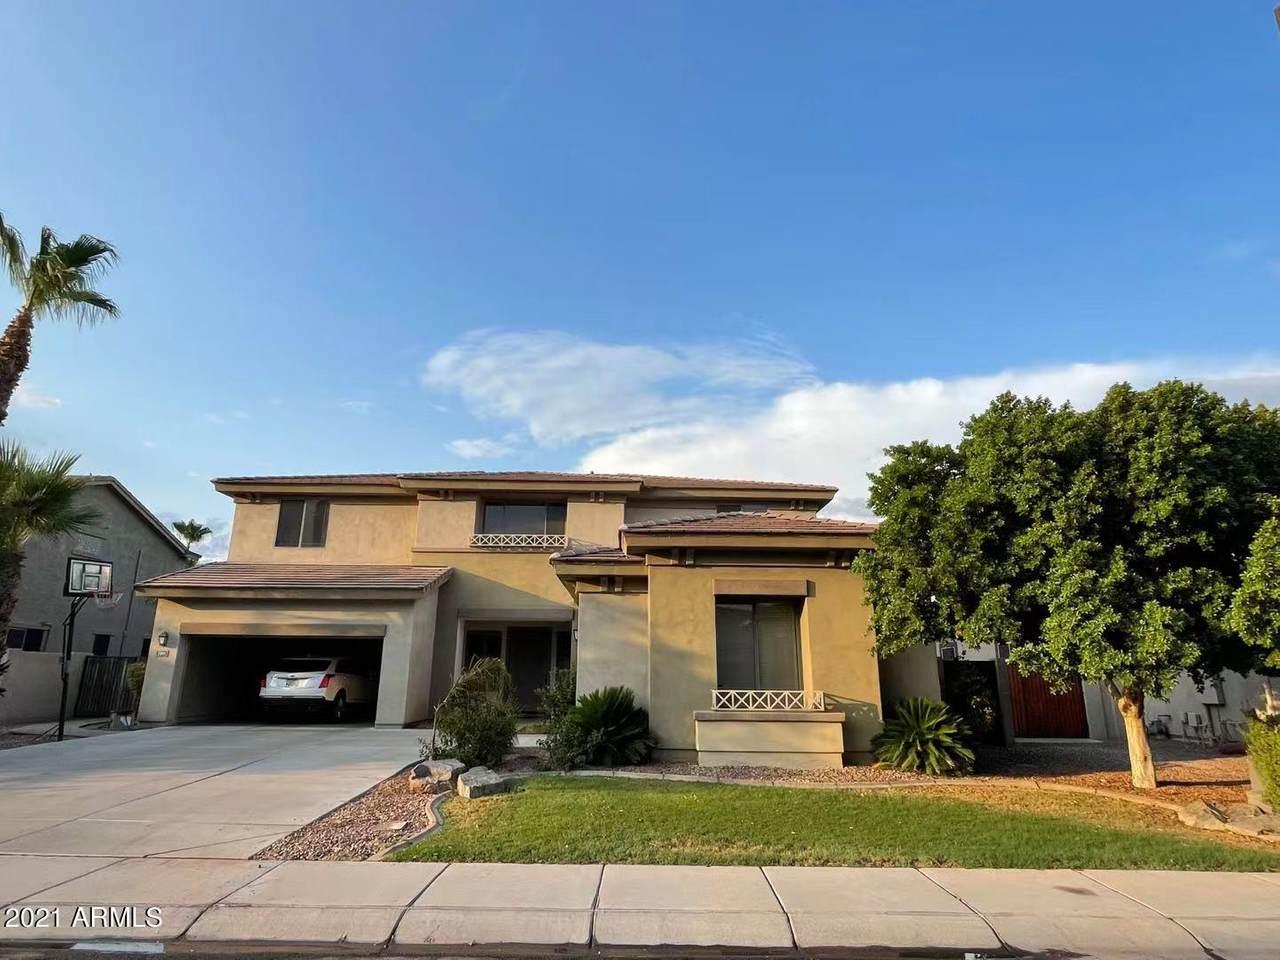 1041 Palo Verde Street - Photo 1